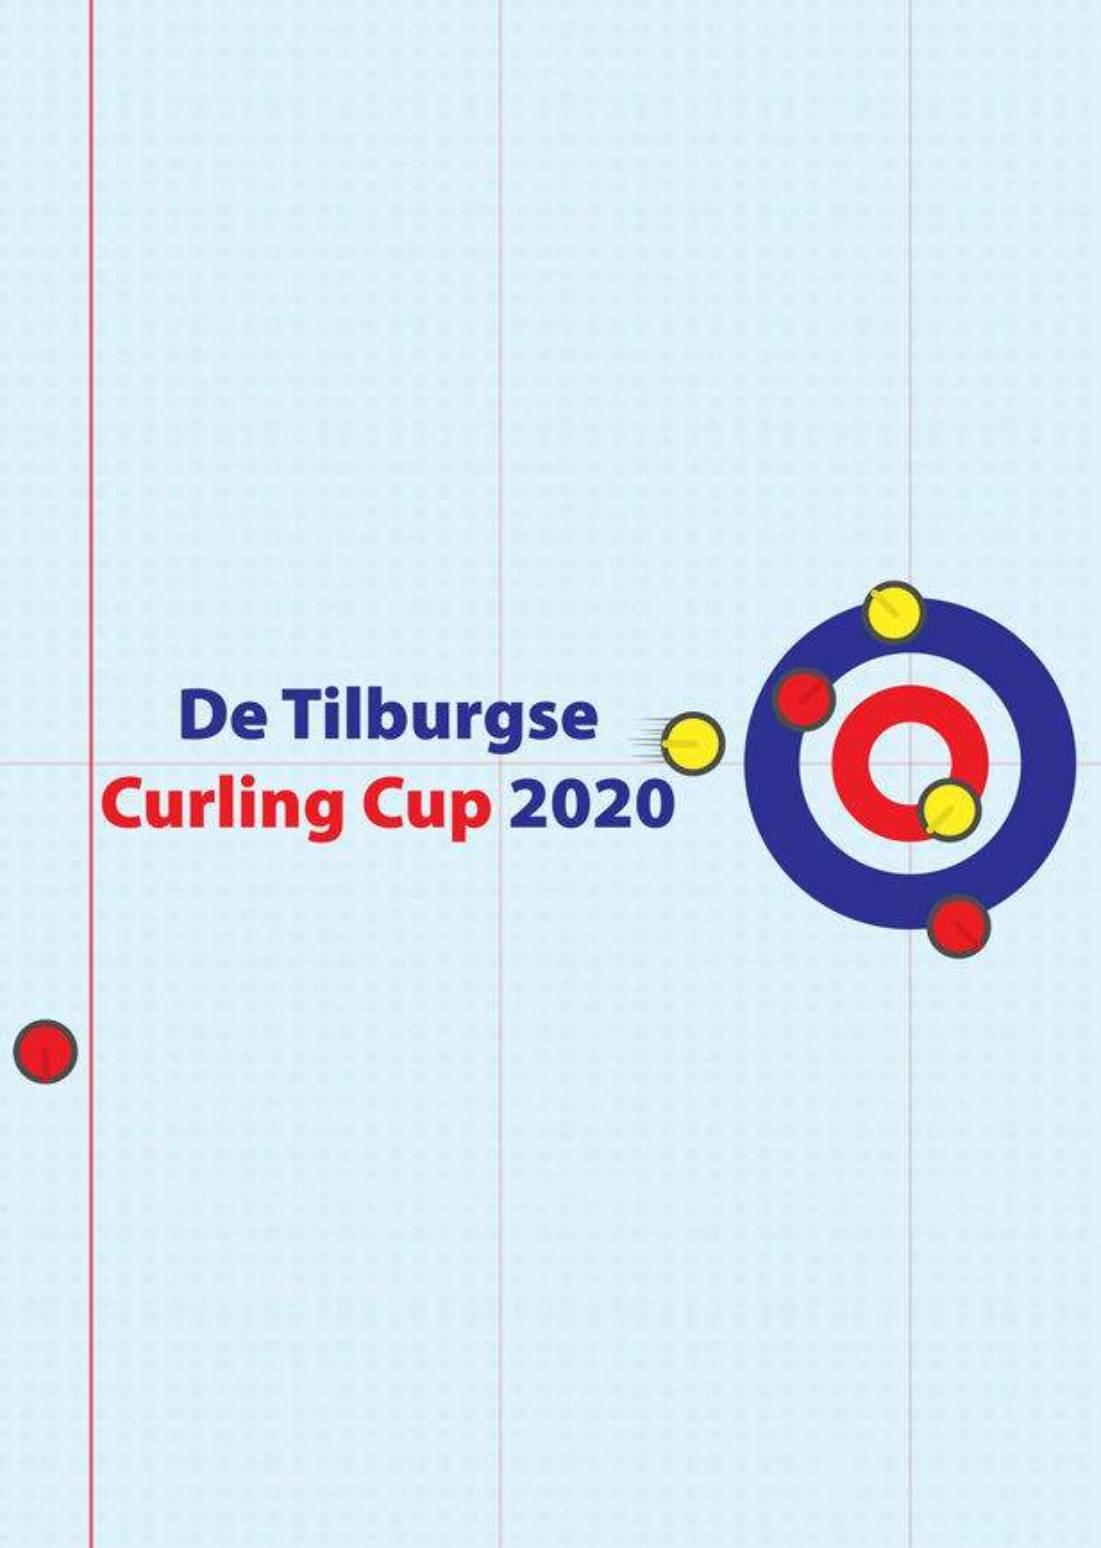 Tilburgse Curling Cup | Uitverkocht